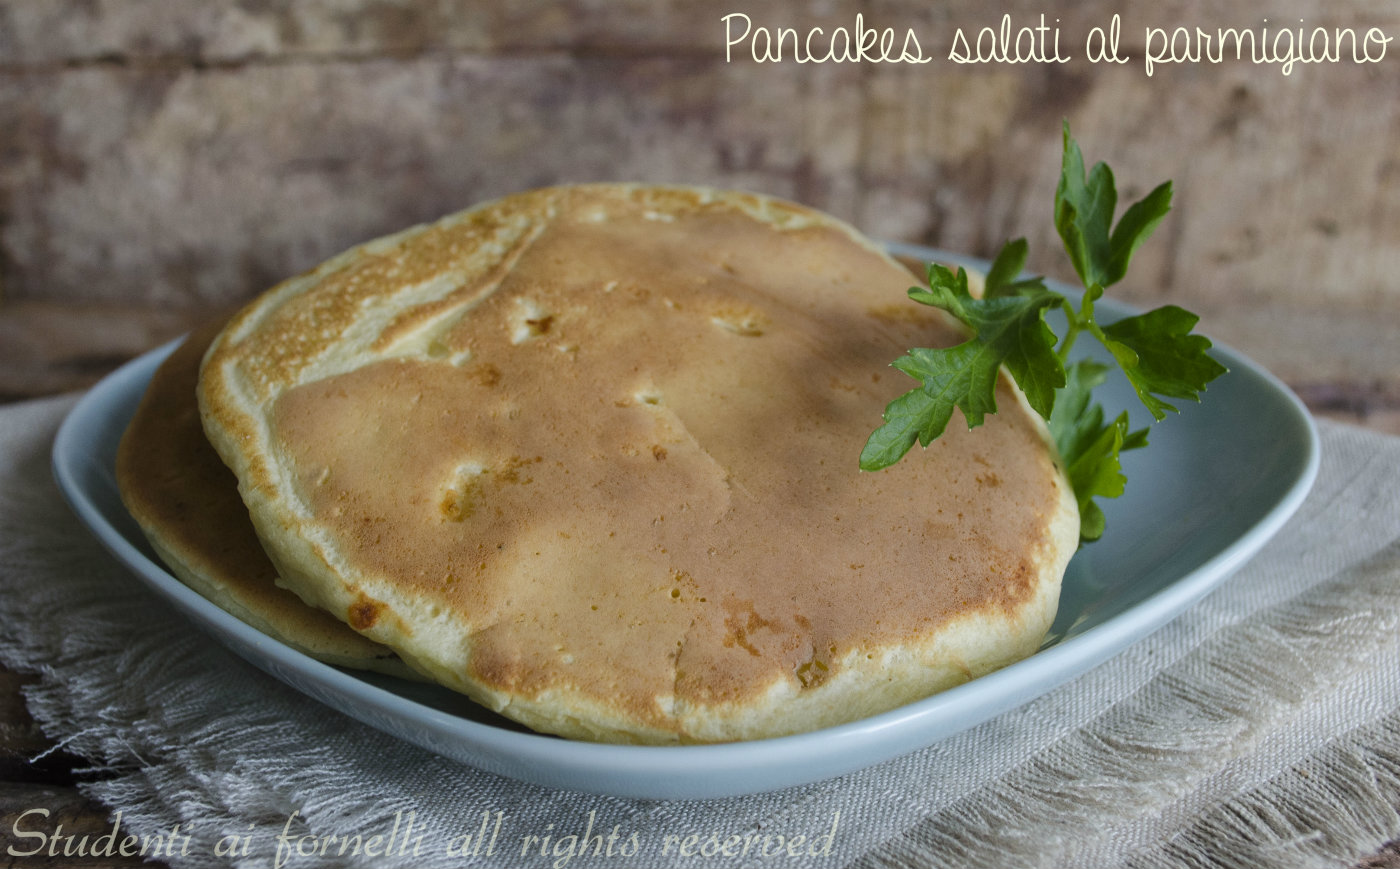 Famoso Pancakes salati al parmigiano facile e veloci, ricetta NI07